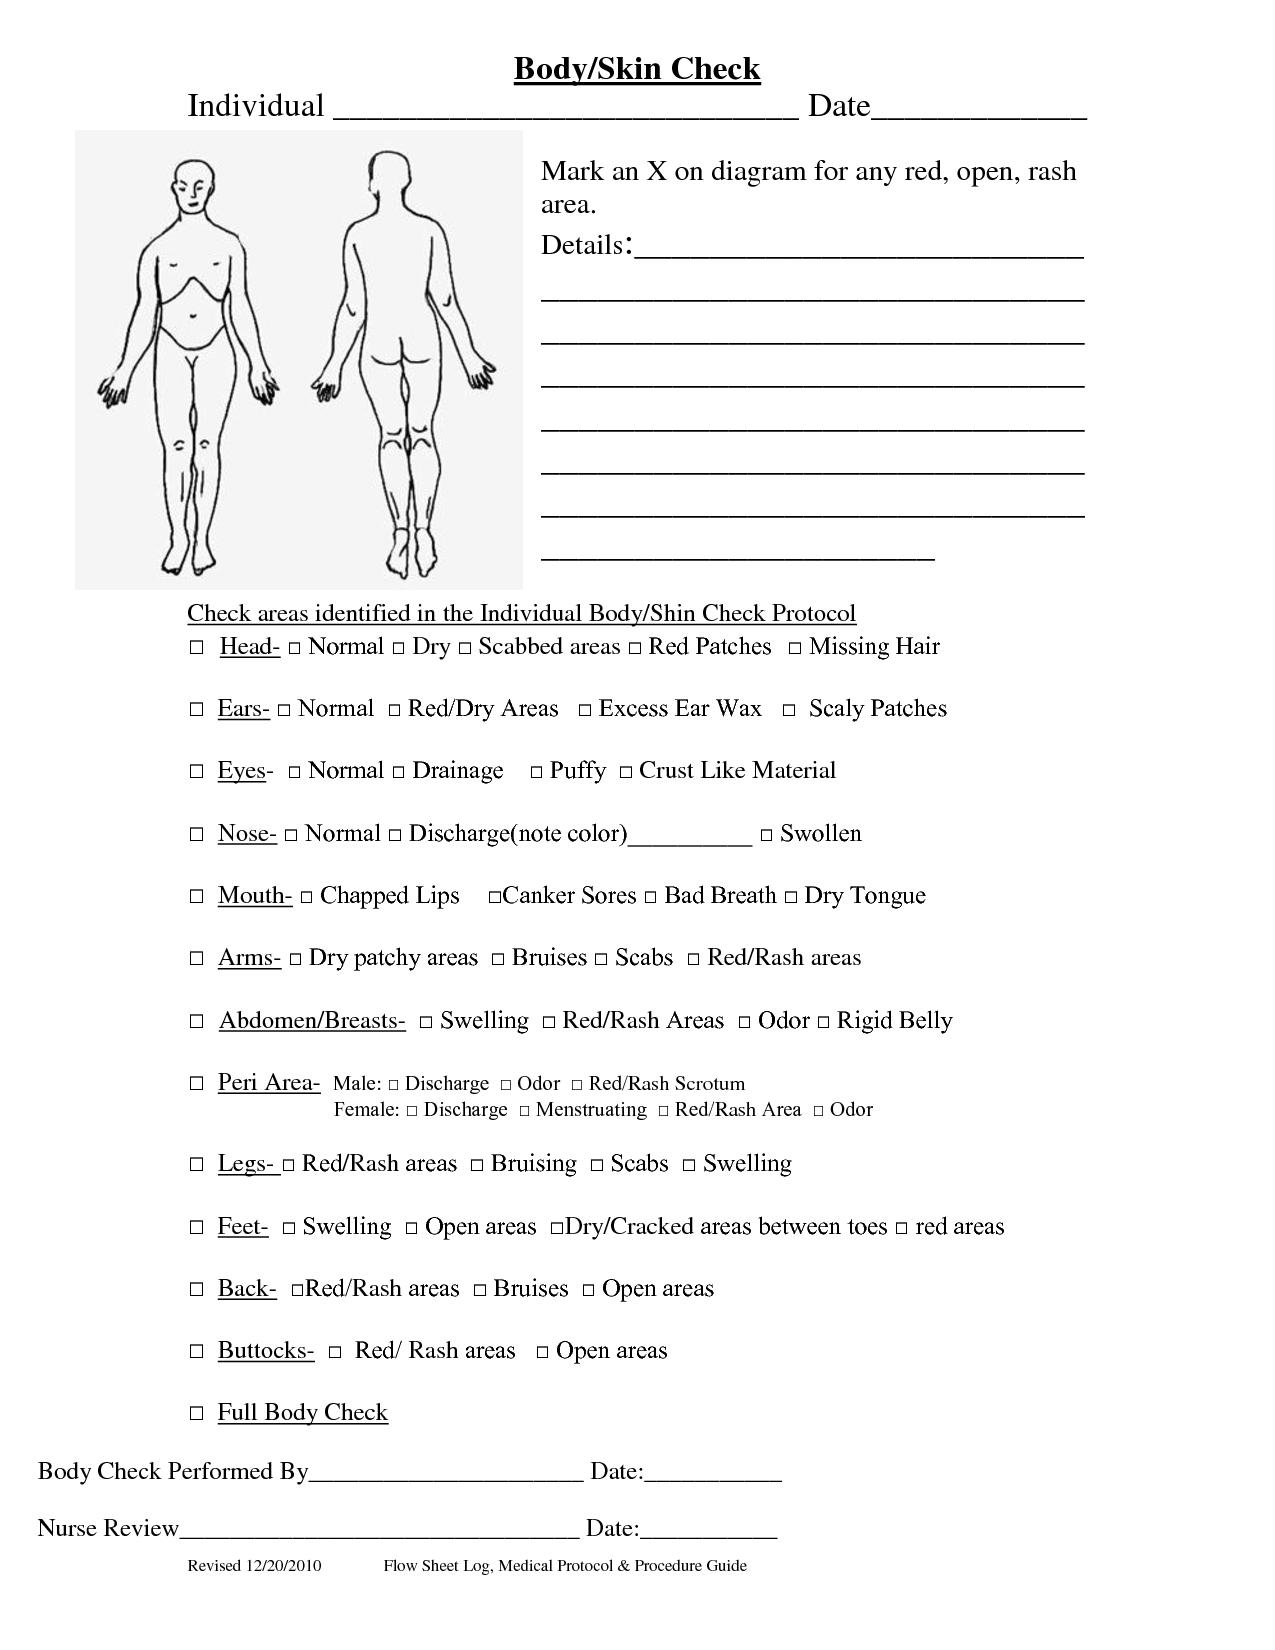 Body Check Sheet